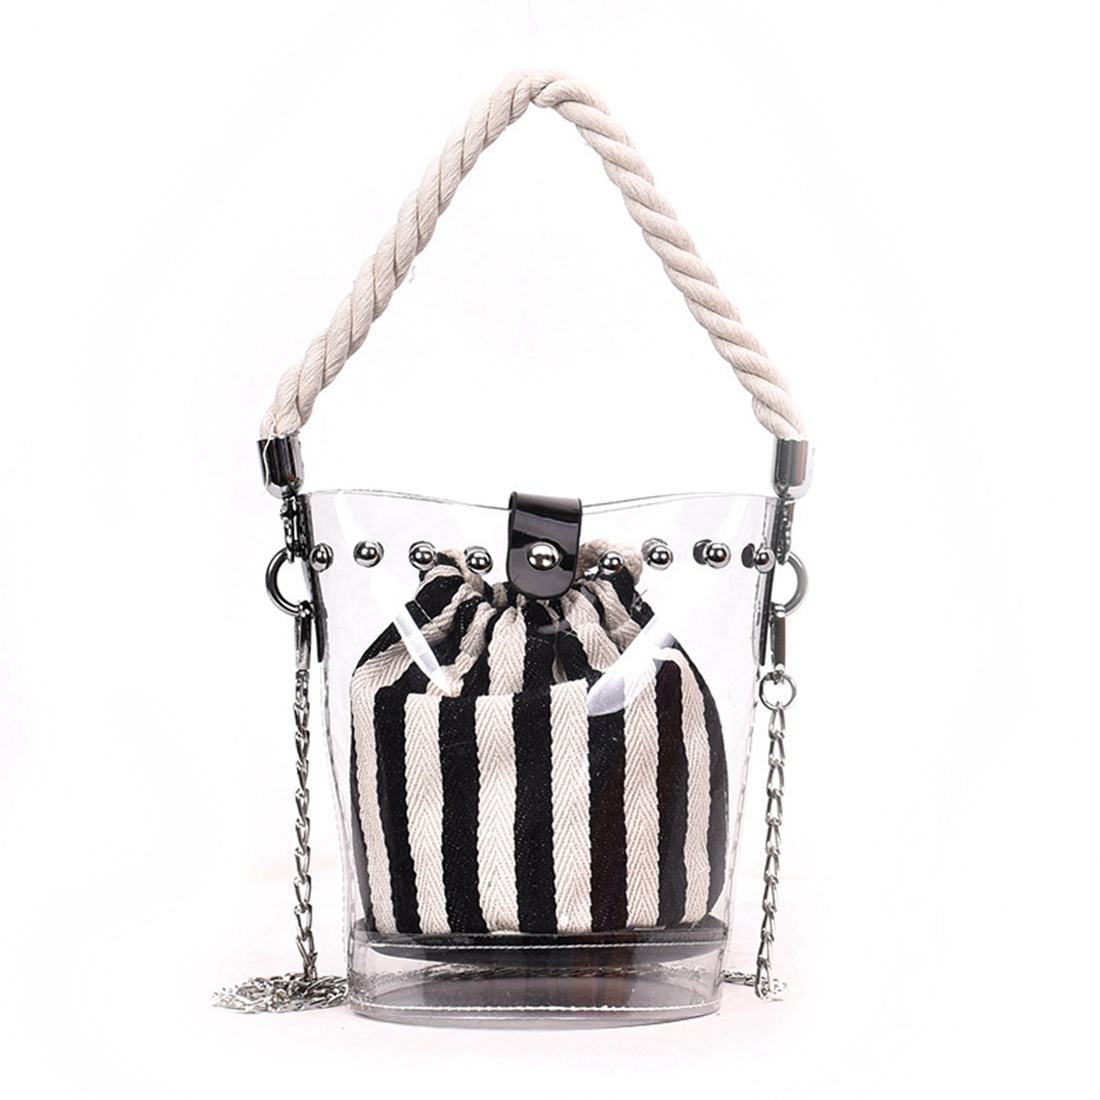 HEBA Hot Sale Black New Fashion PVC Chain Diagonal Bag Fashion Transparent Hit color Stripe Rivet Hemp Single shoulder Diagona